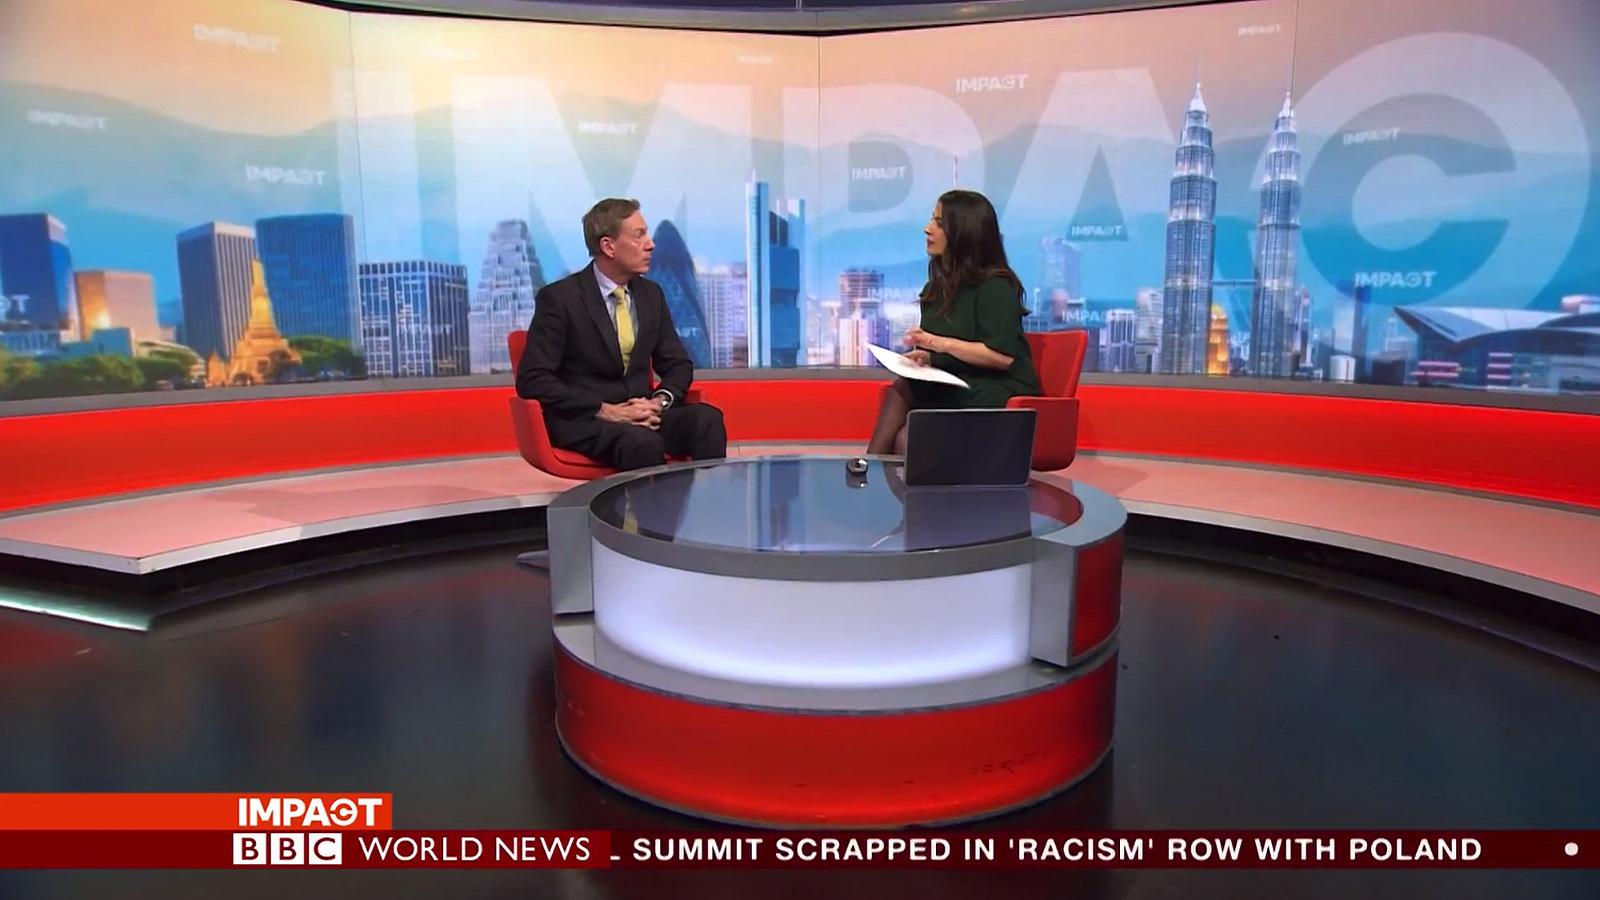 NCS_BBC-World-News_Impact_014